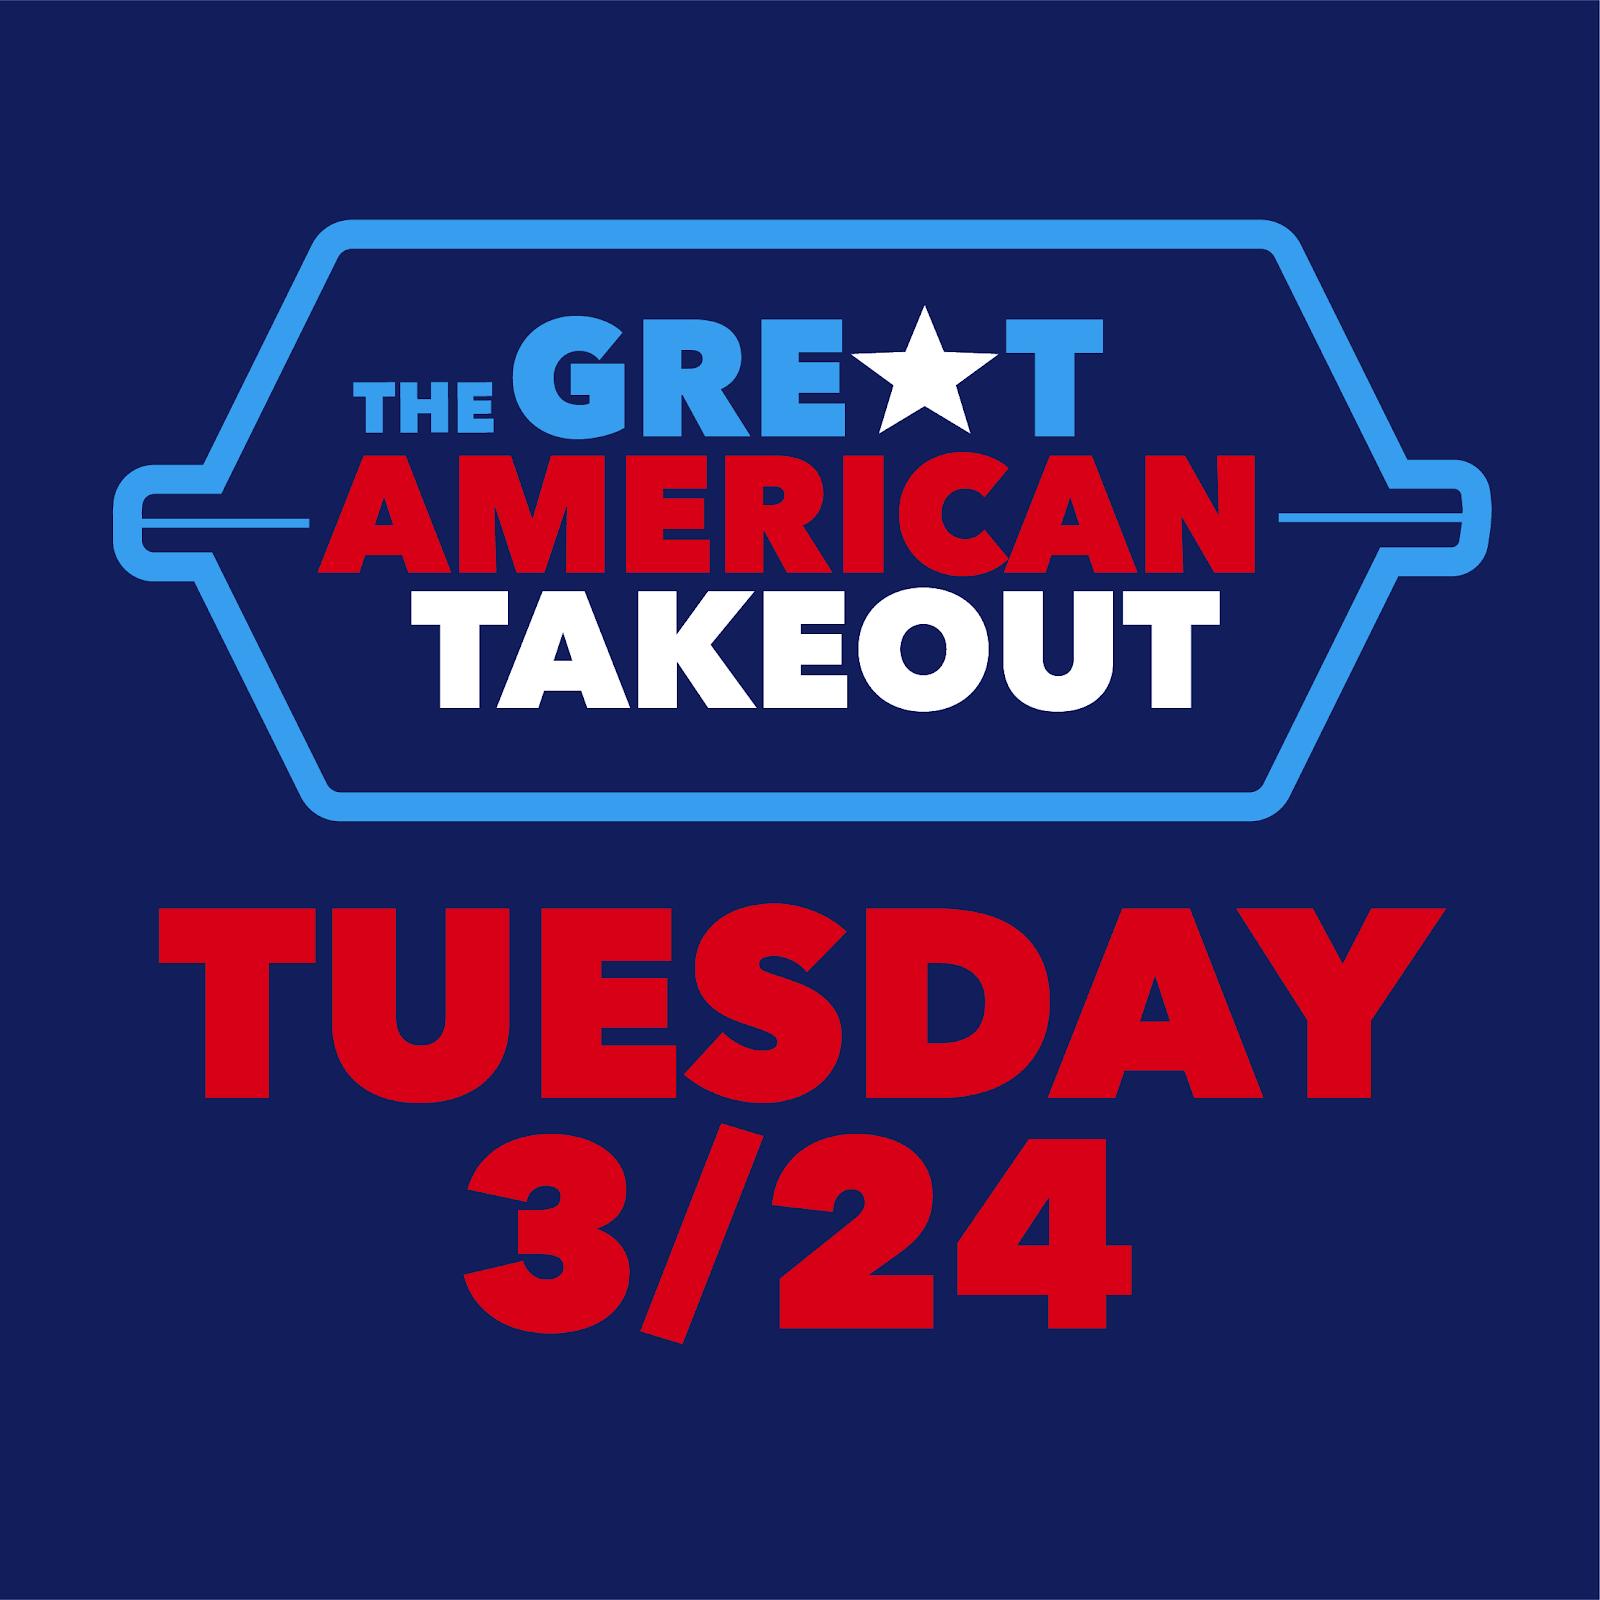 Join #TheGreatAmericanTakeout